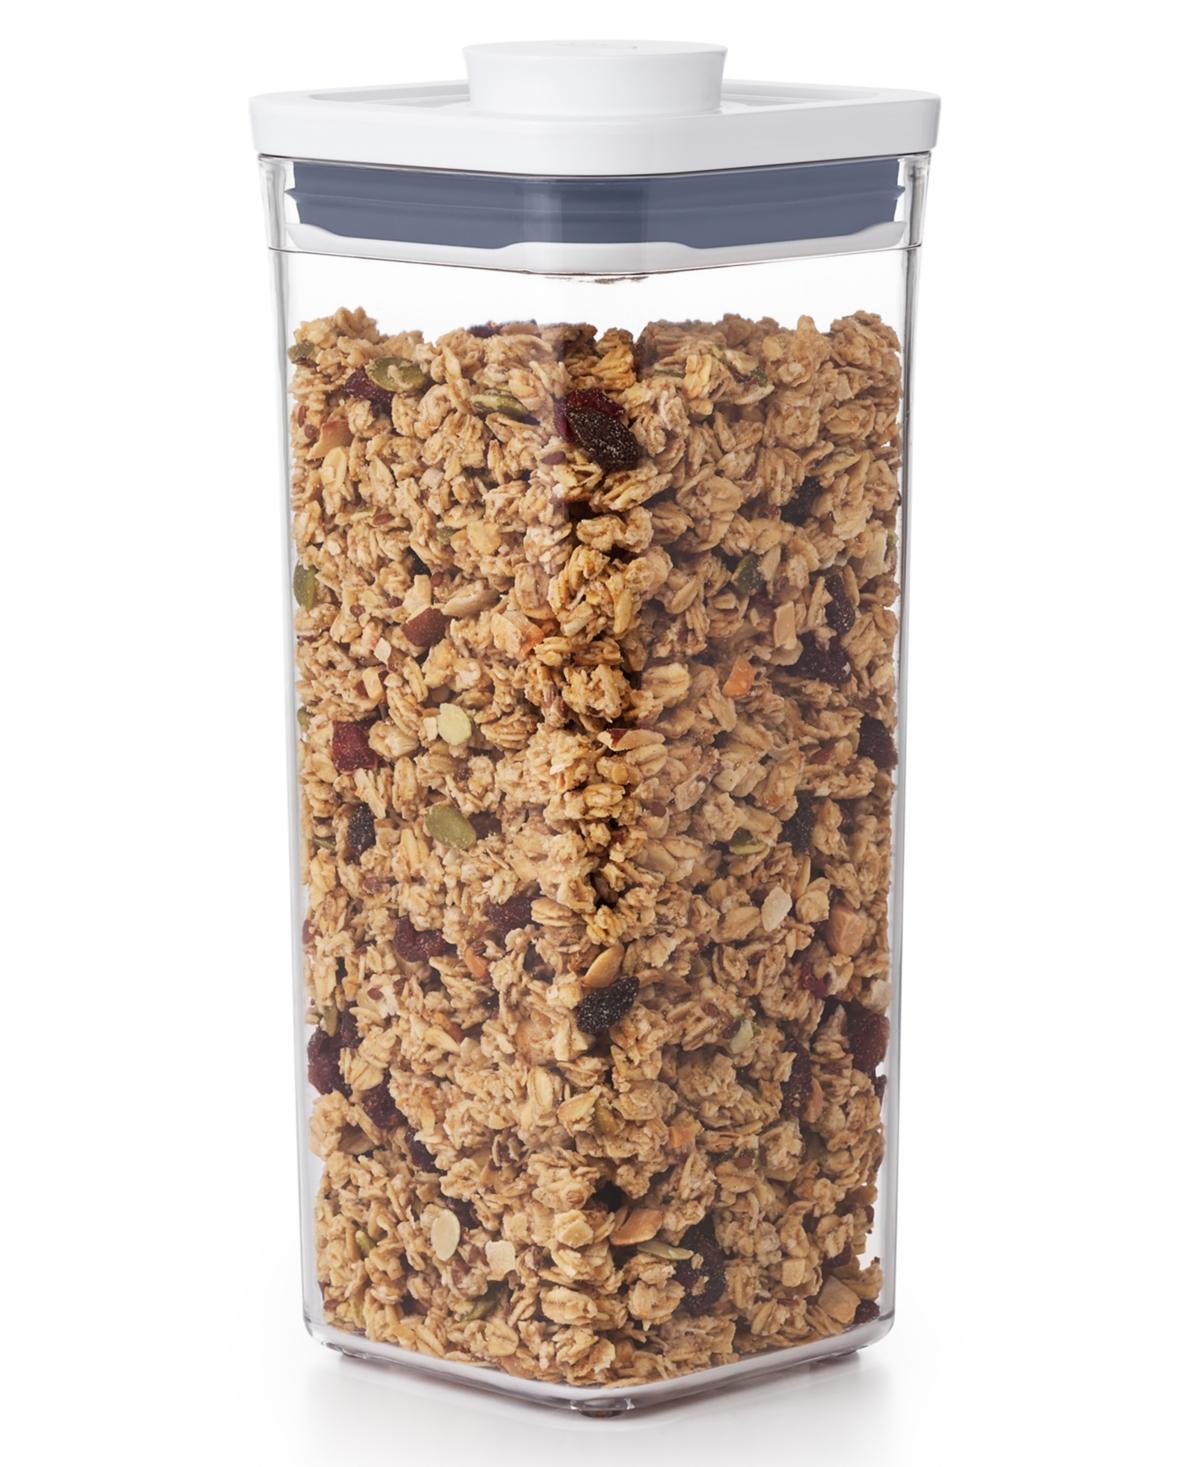 Oxo Pop Small Square Medium Food Storage Container